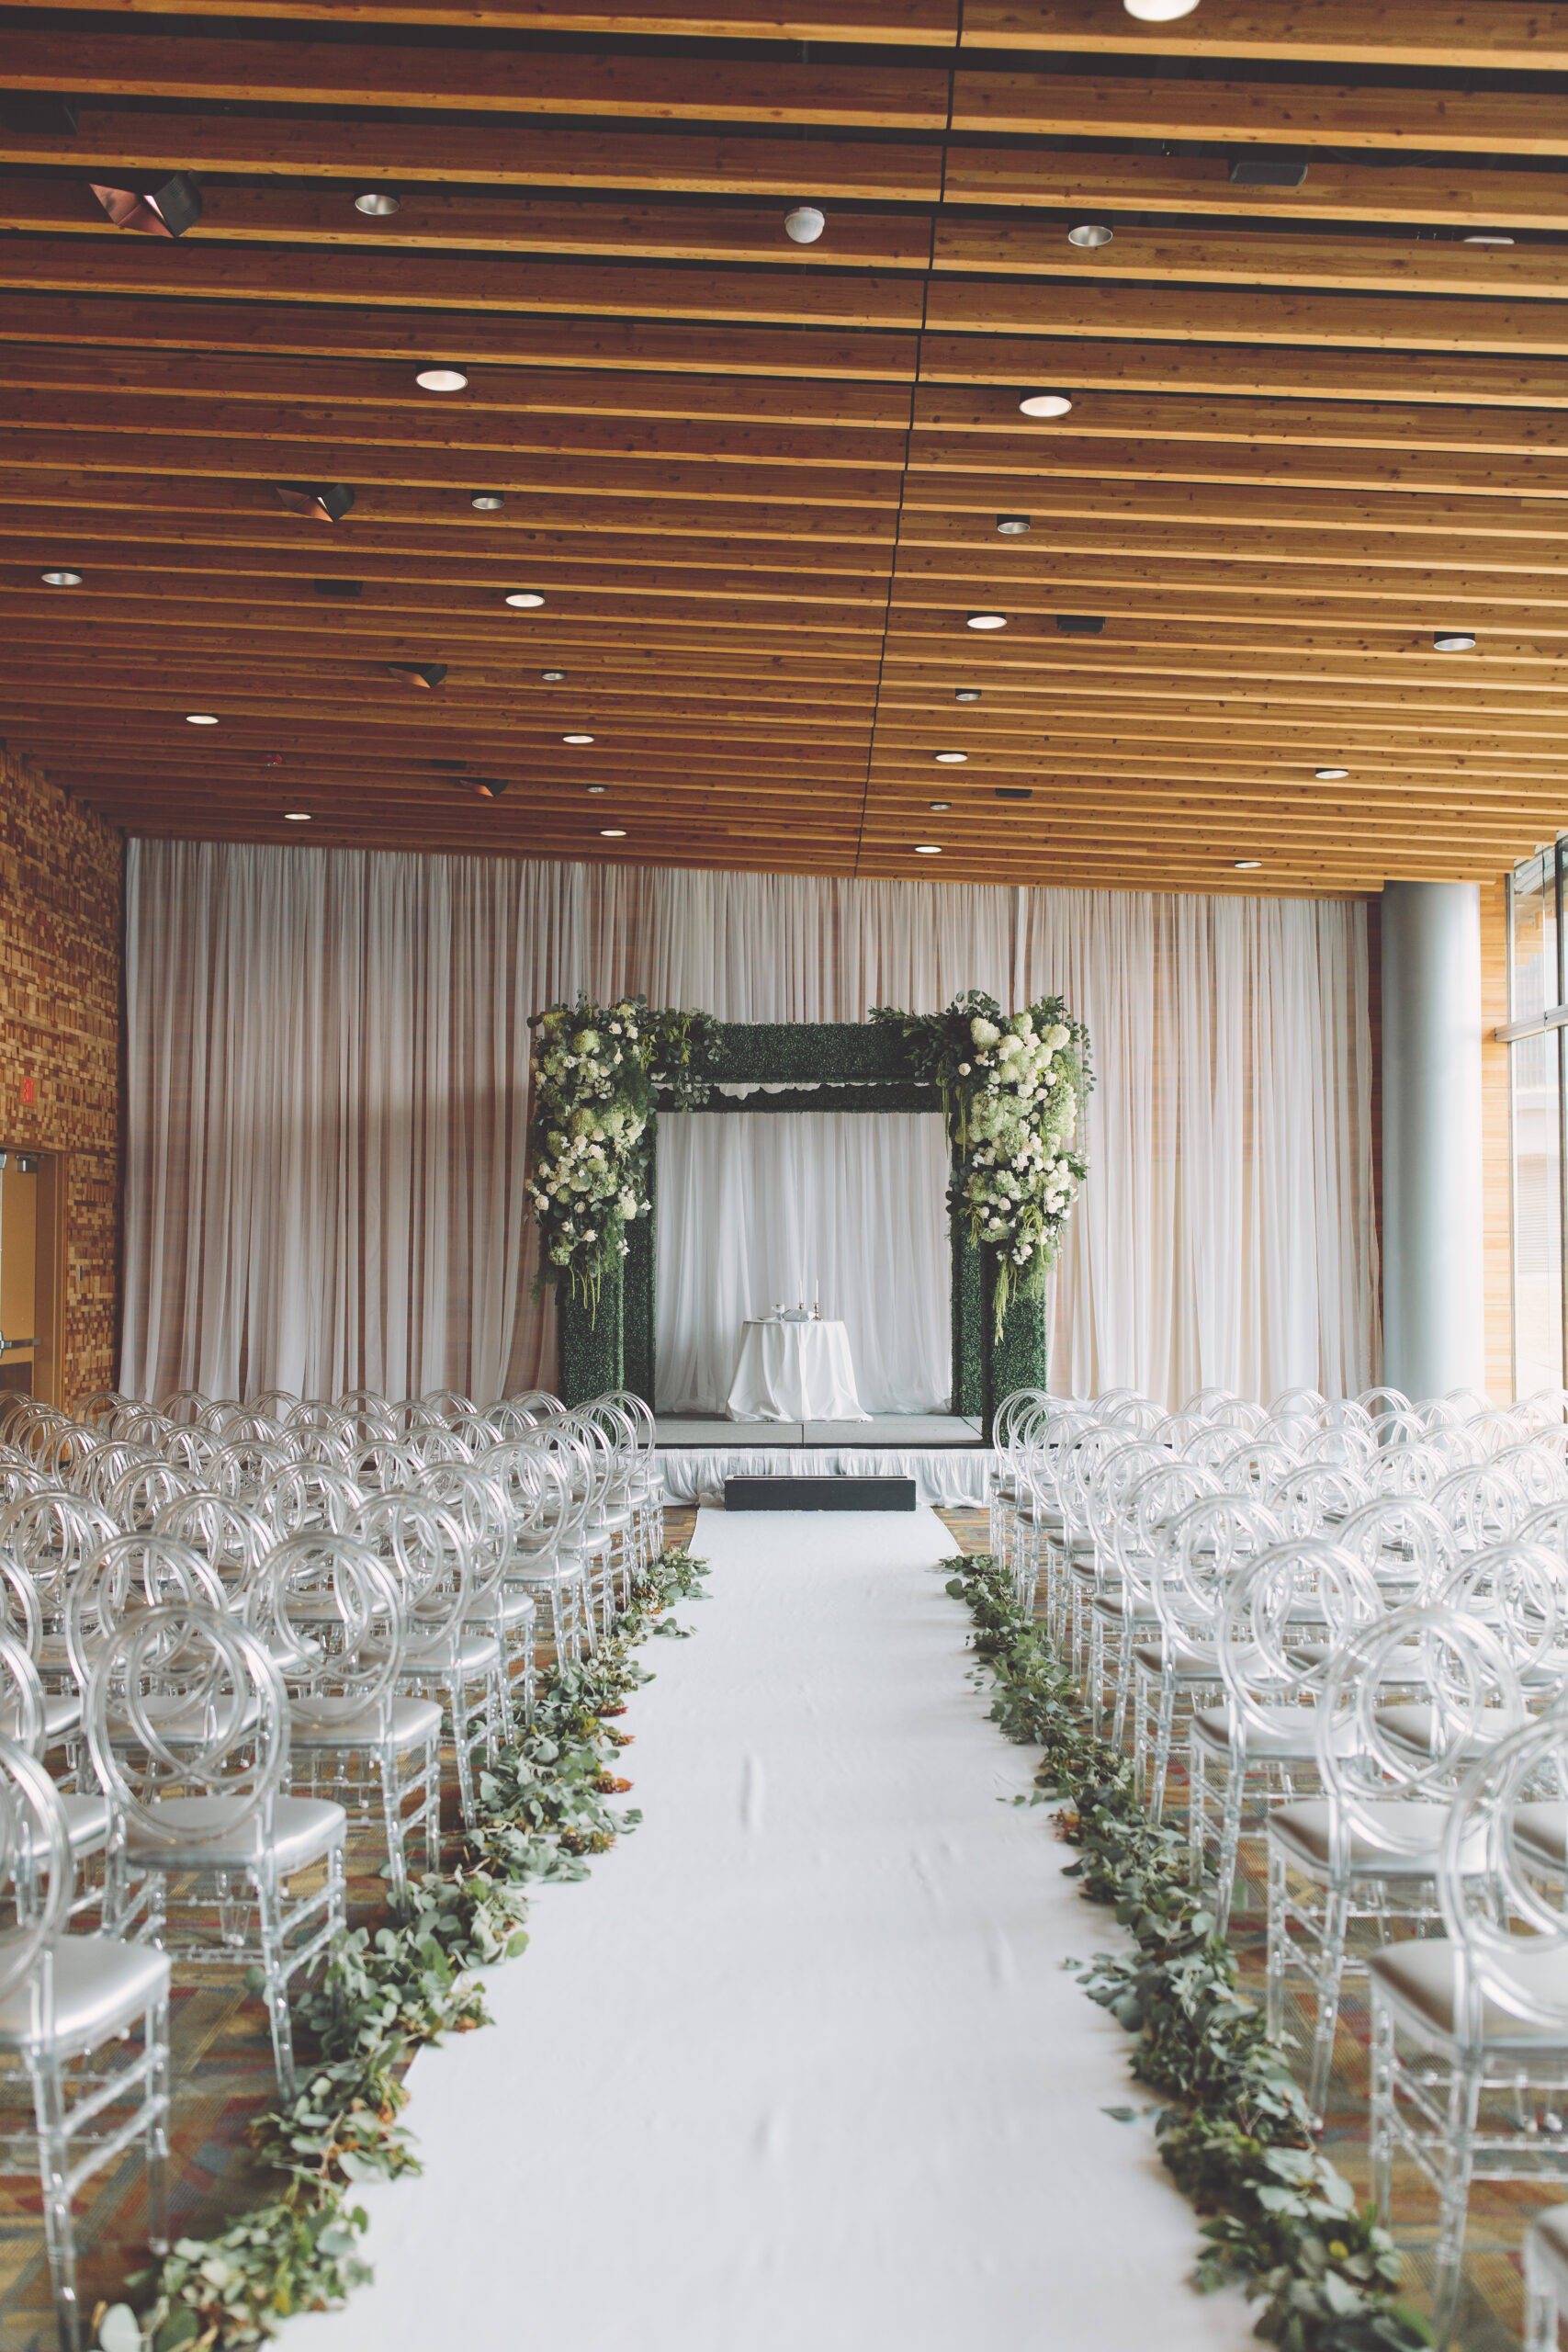 https://secureservercdn.net/45.40.145.151/kgq.ab5.myftpupload.com/wp-content/uploads/2020/04/Amanda-Daniel-Wedding-0393-scaled.jpg?time=1627956768